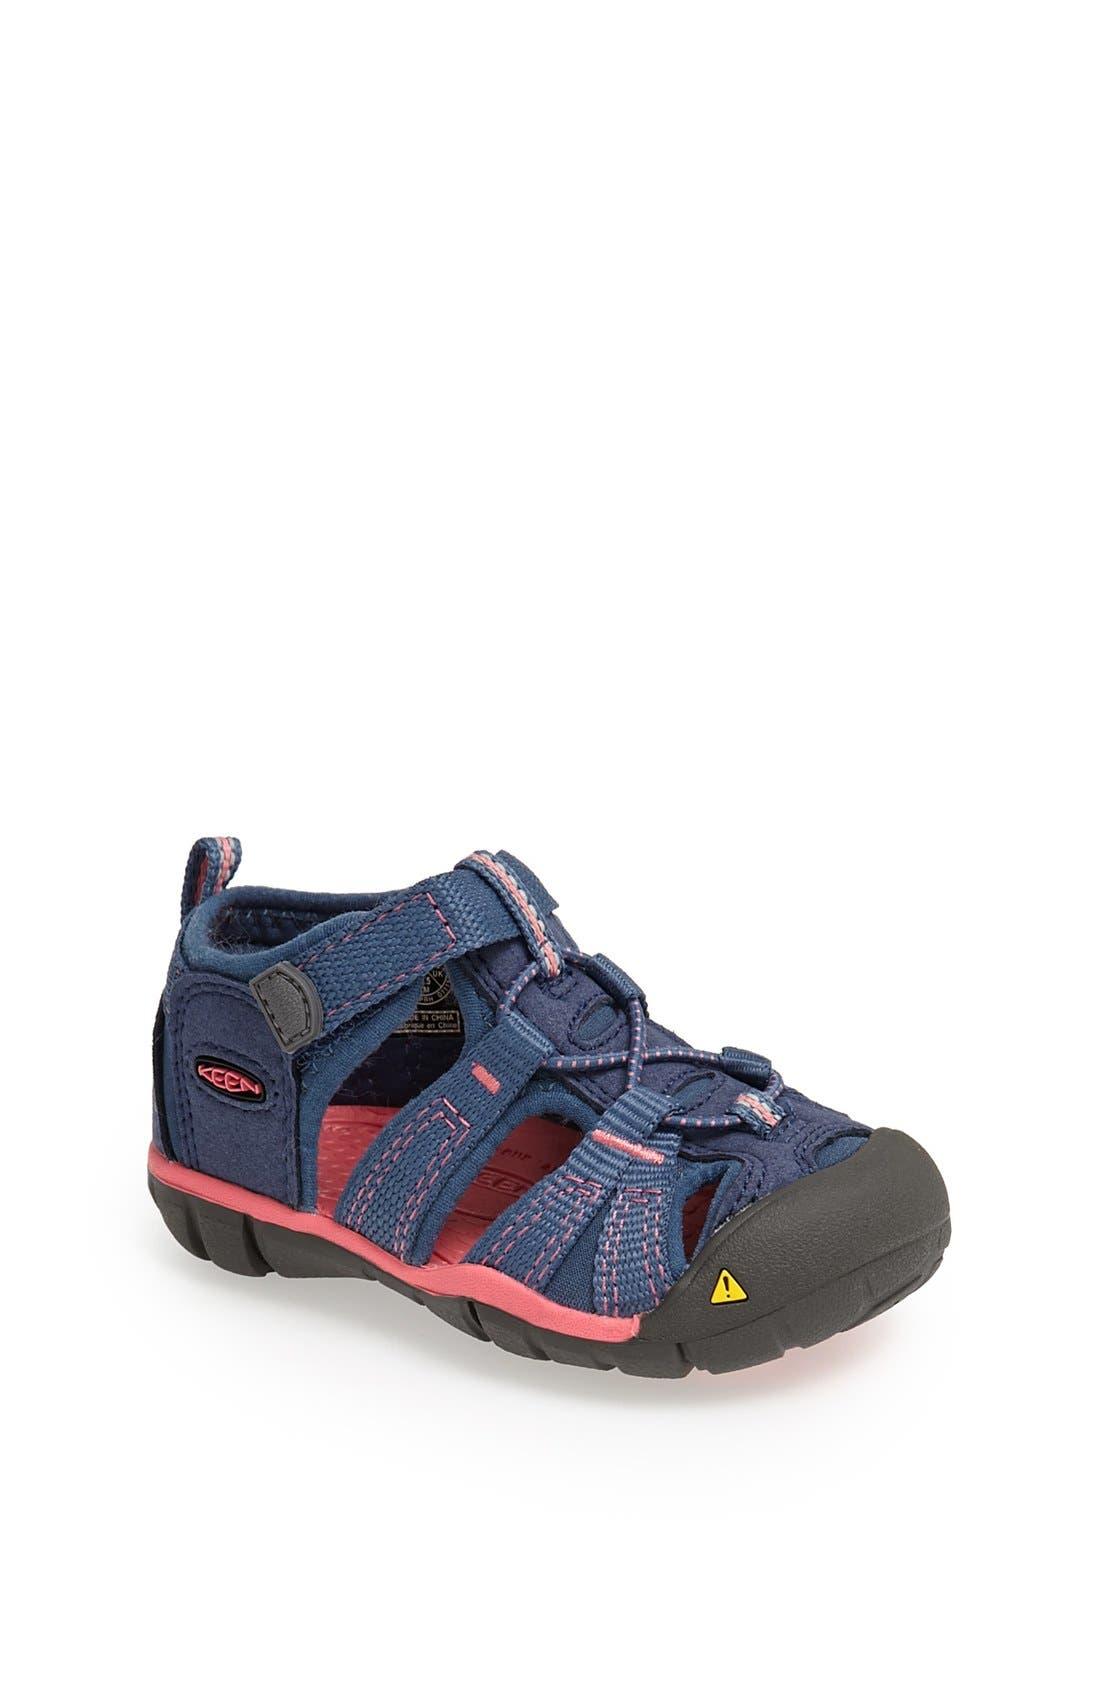 'Seacamp II' Waterproof Sandal,                         Main,                         color, 415